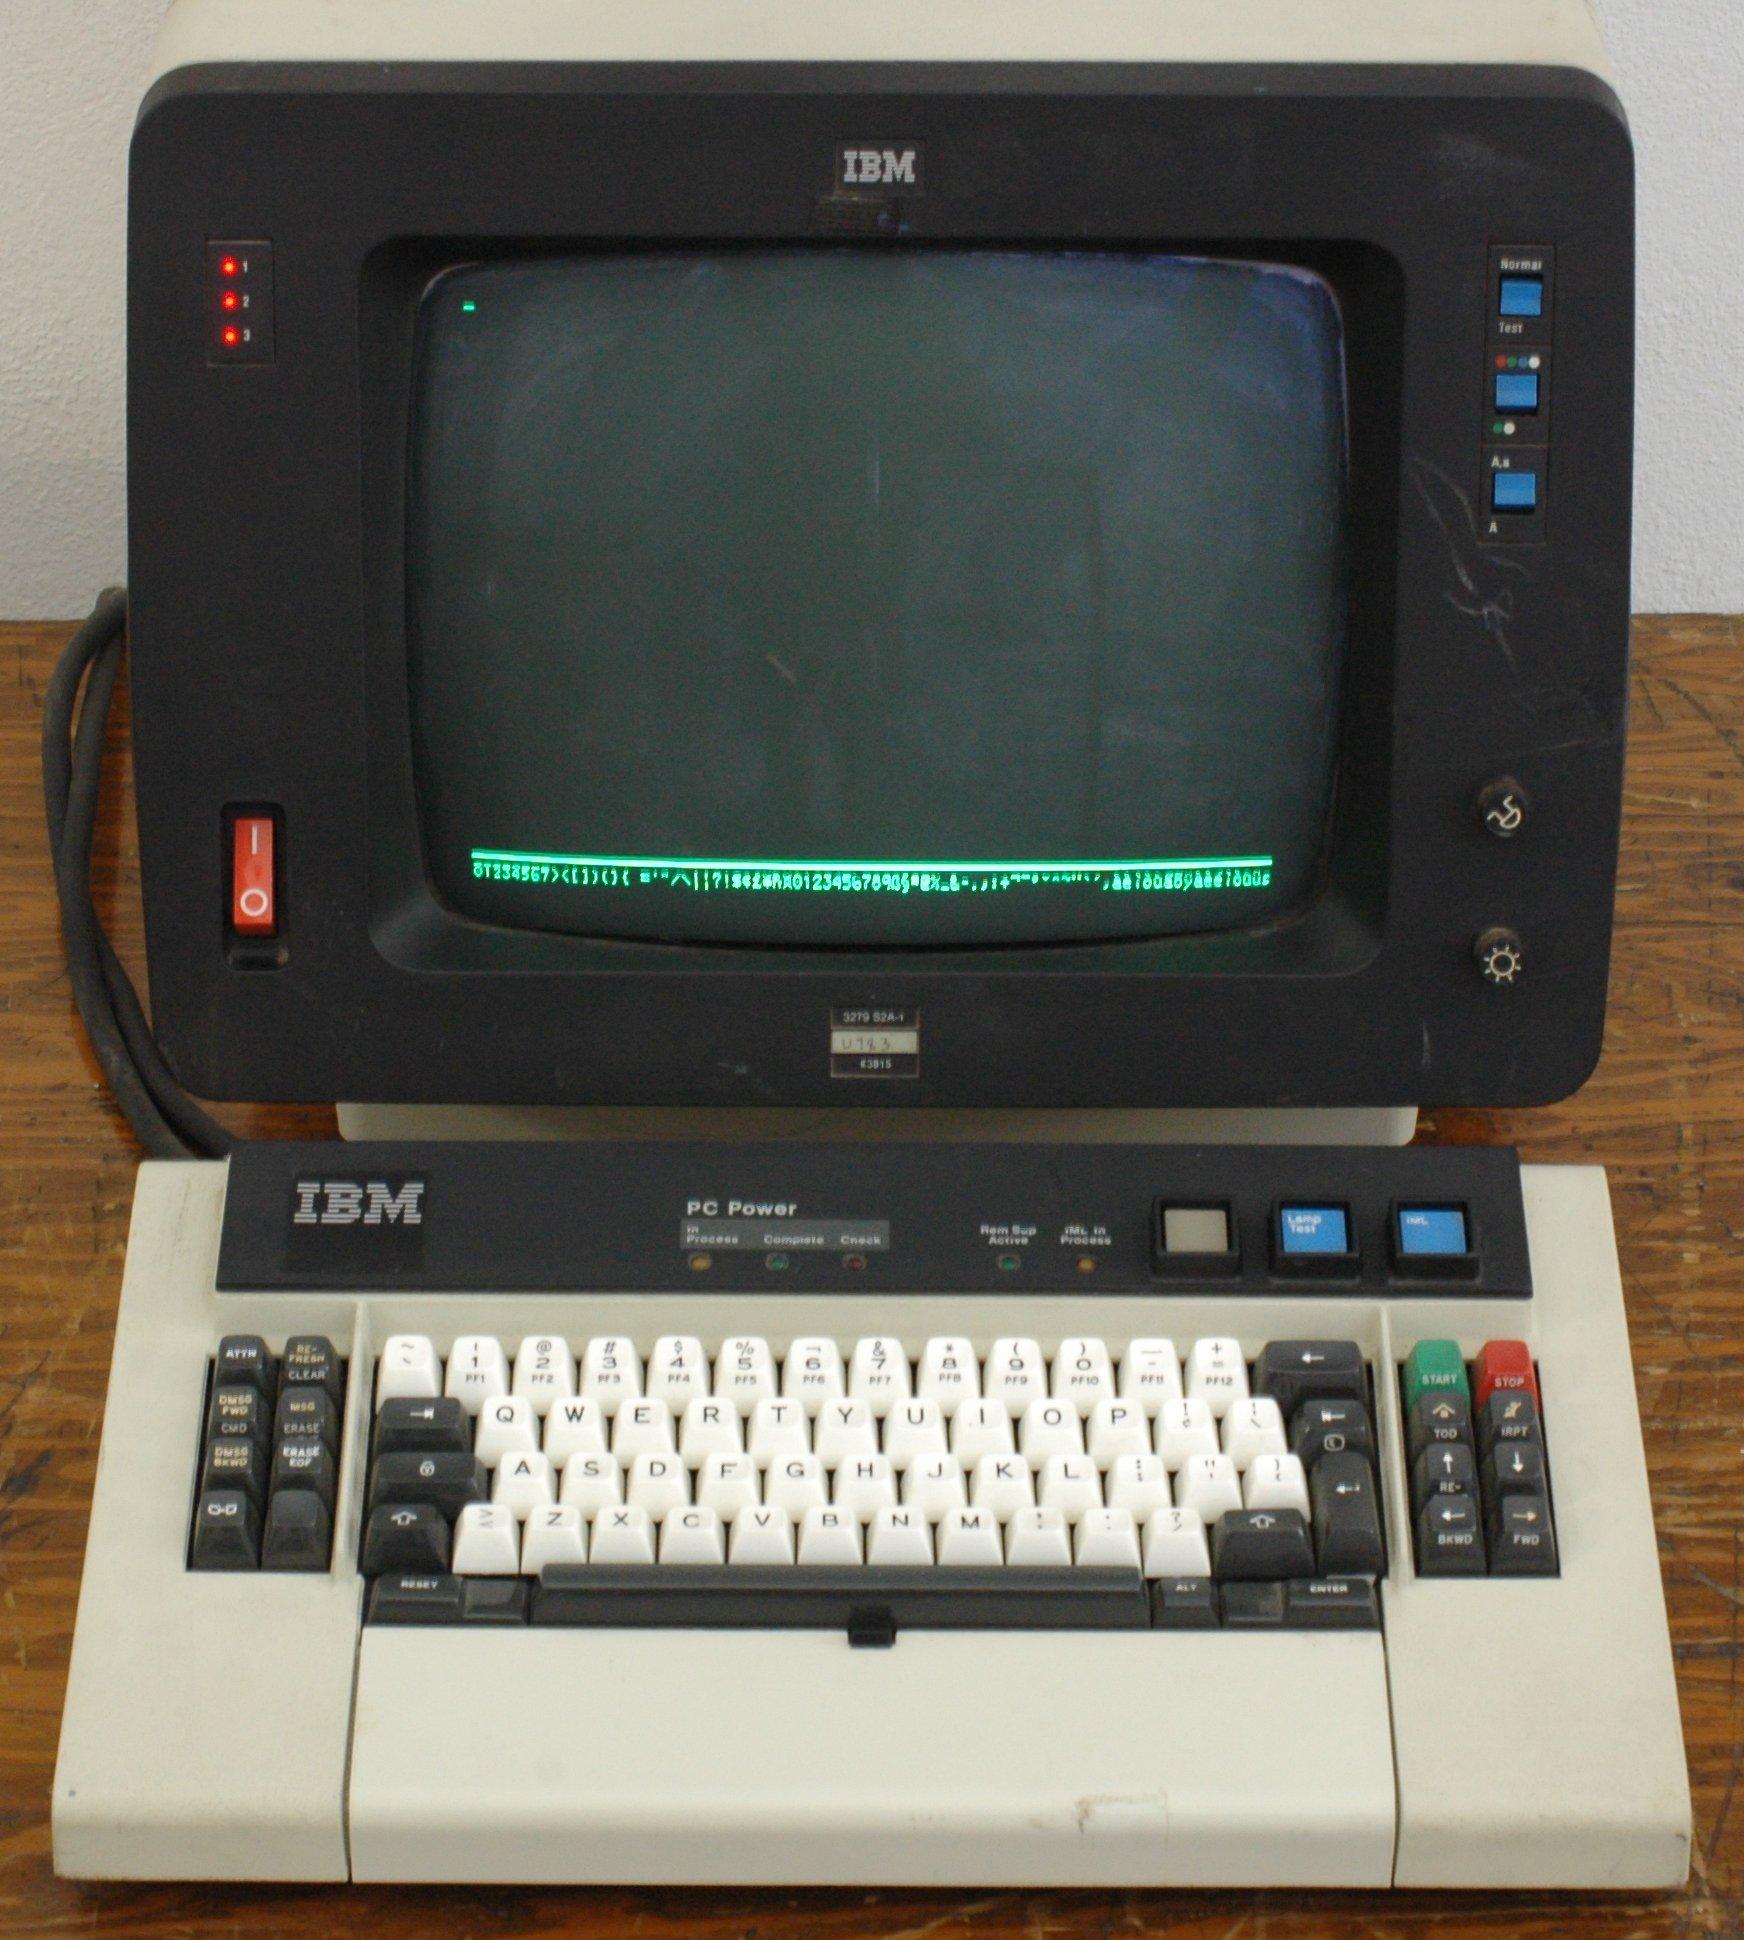 https://upload.wikimedia.org/wikipedia/commons/a/a8/IBM-3279.jpg